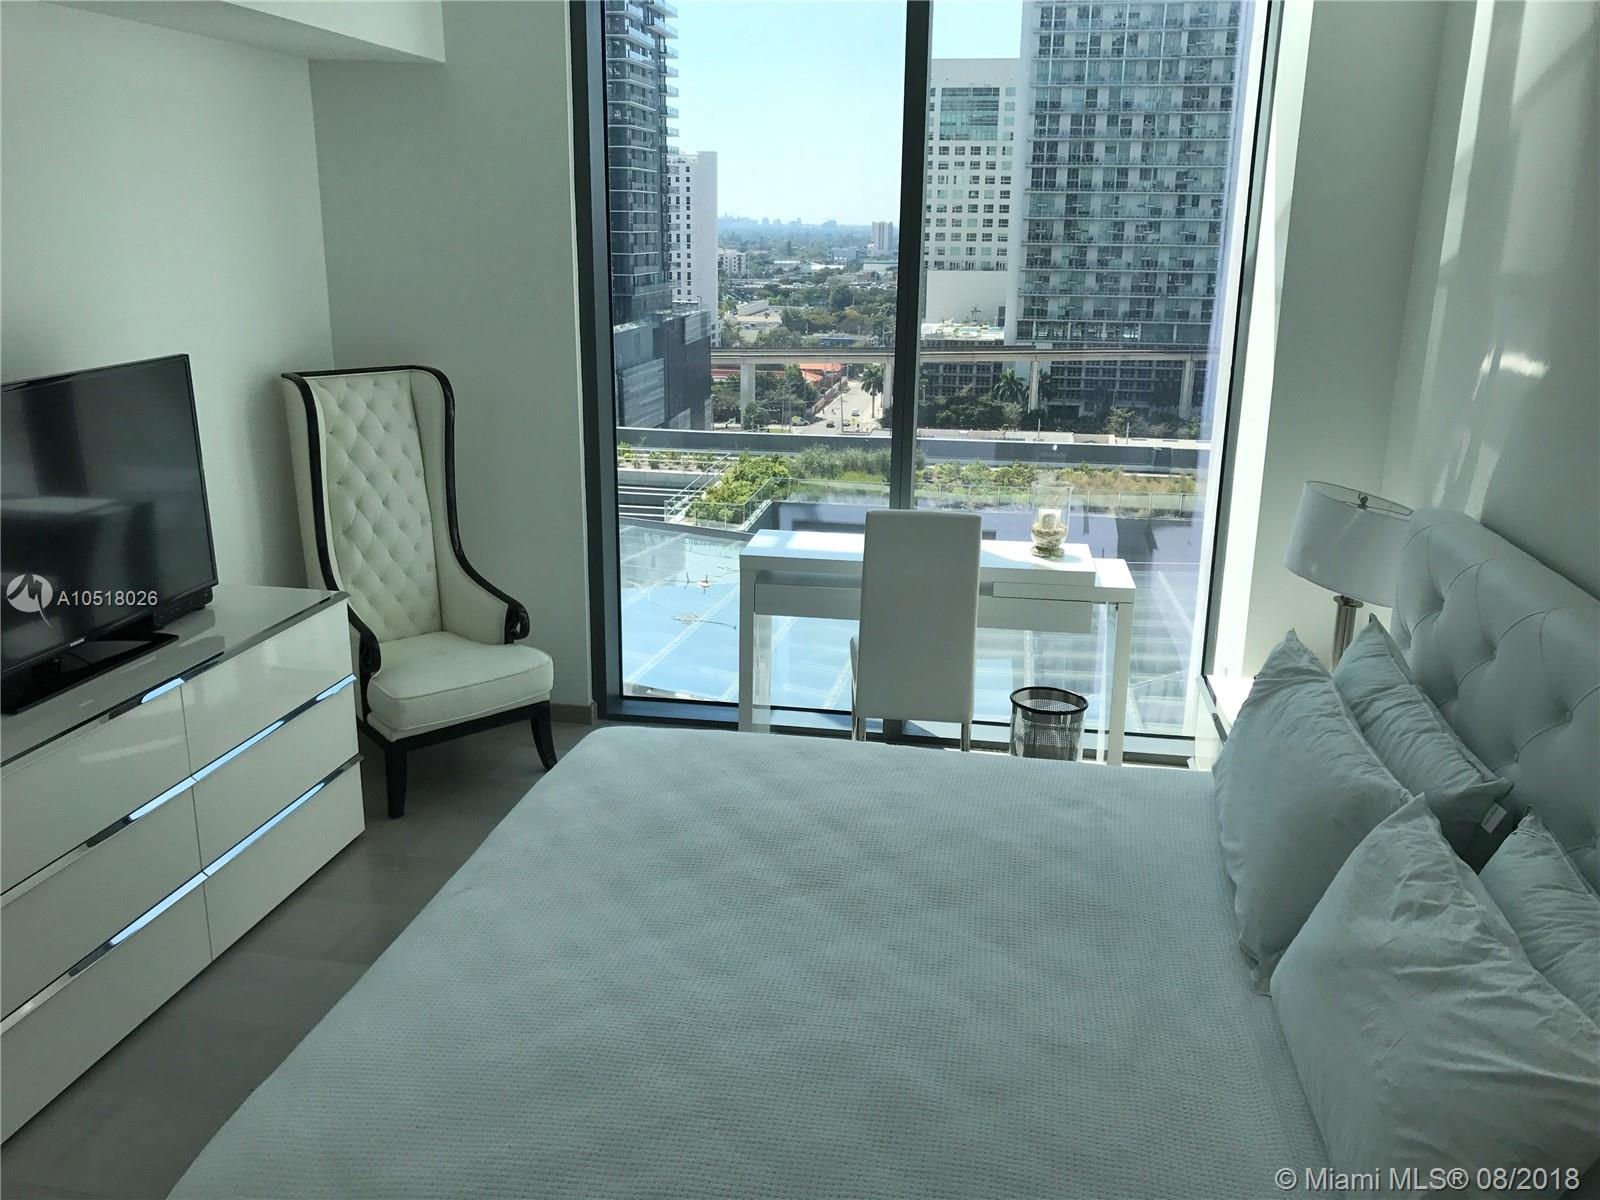 601, 700 and 701 South Miami Avenue and 799 Brickell Plaza, Miami, FL 33131, Brickell CityCentre #1004, Brickell, Miami A10518026 image #5